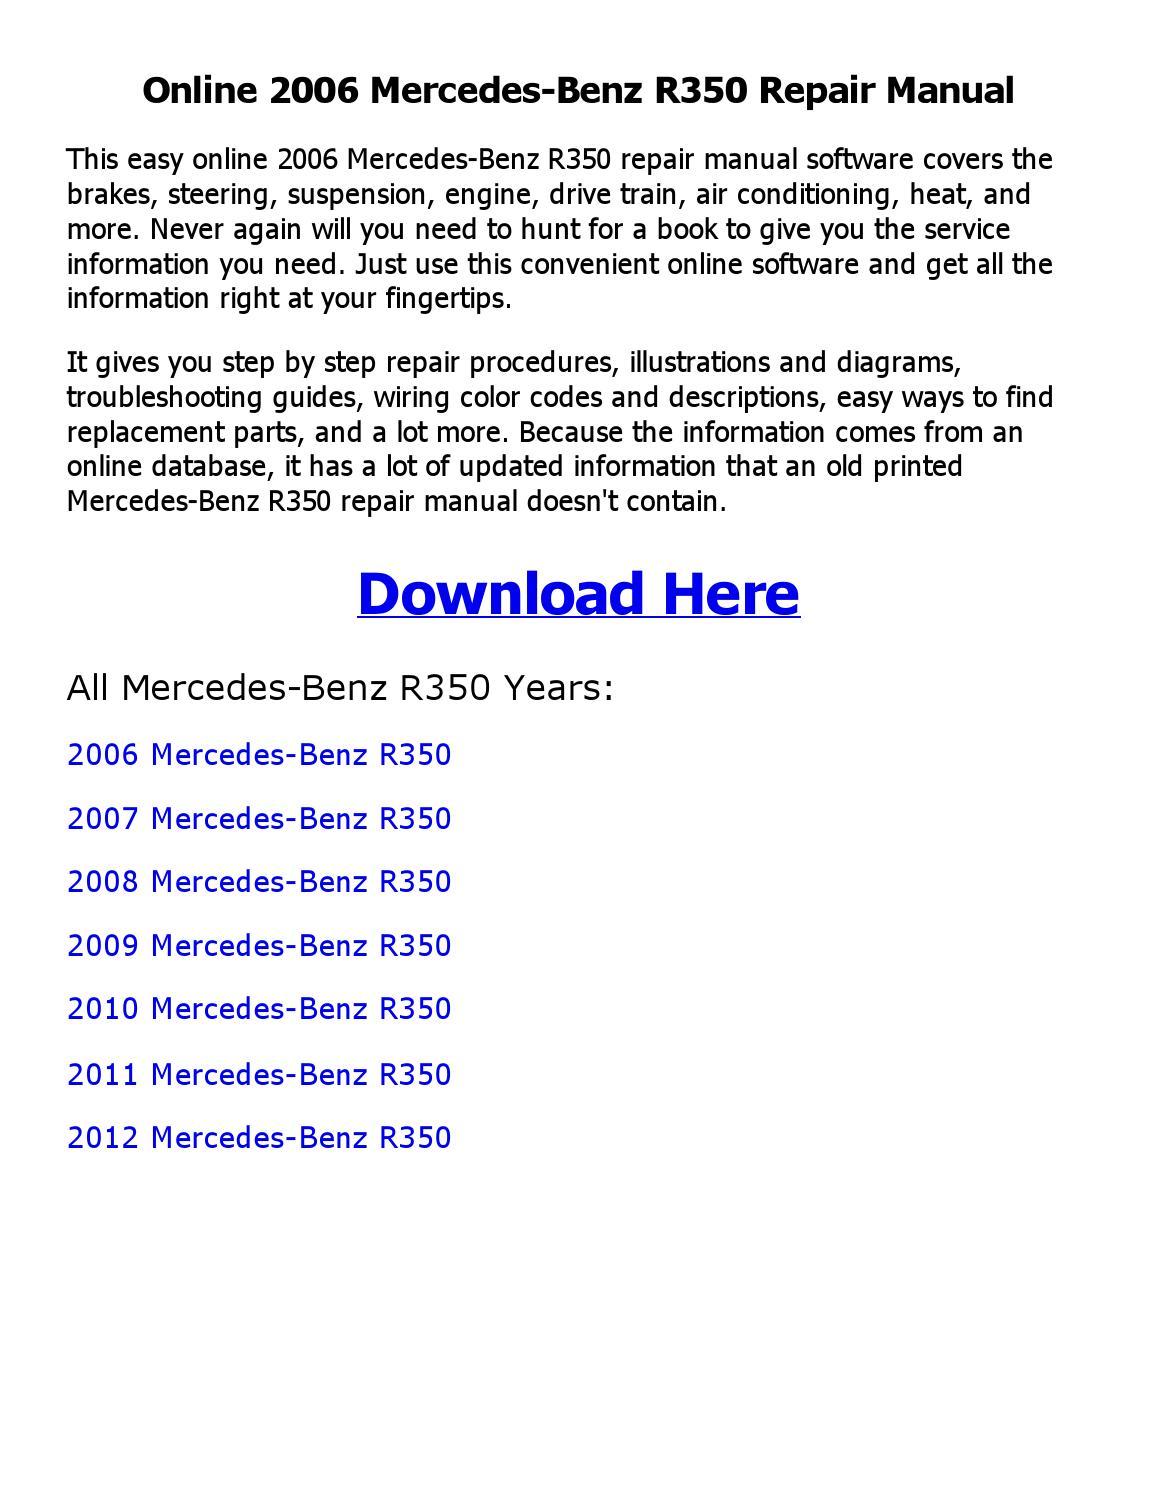 2006 Mercedes Benz R350 Repair Manual Online By Coollang